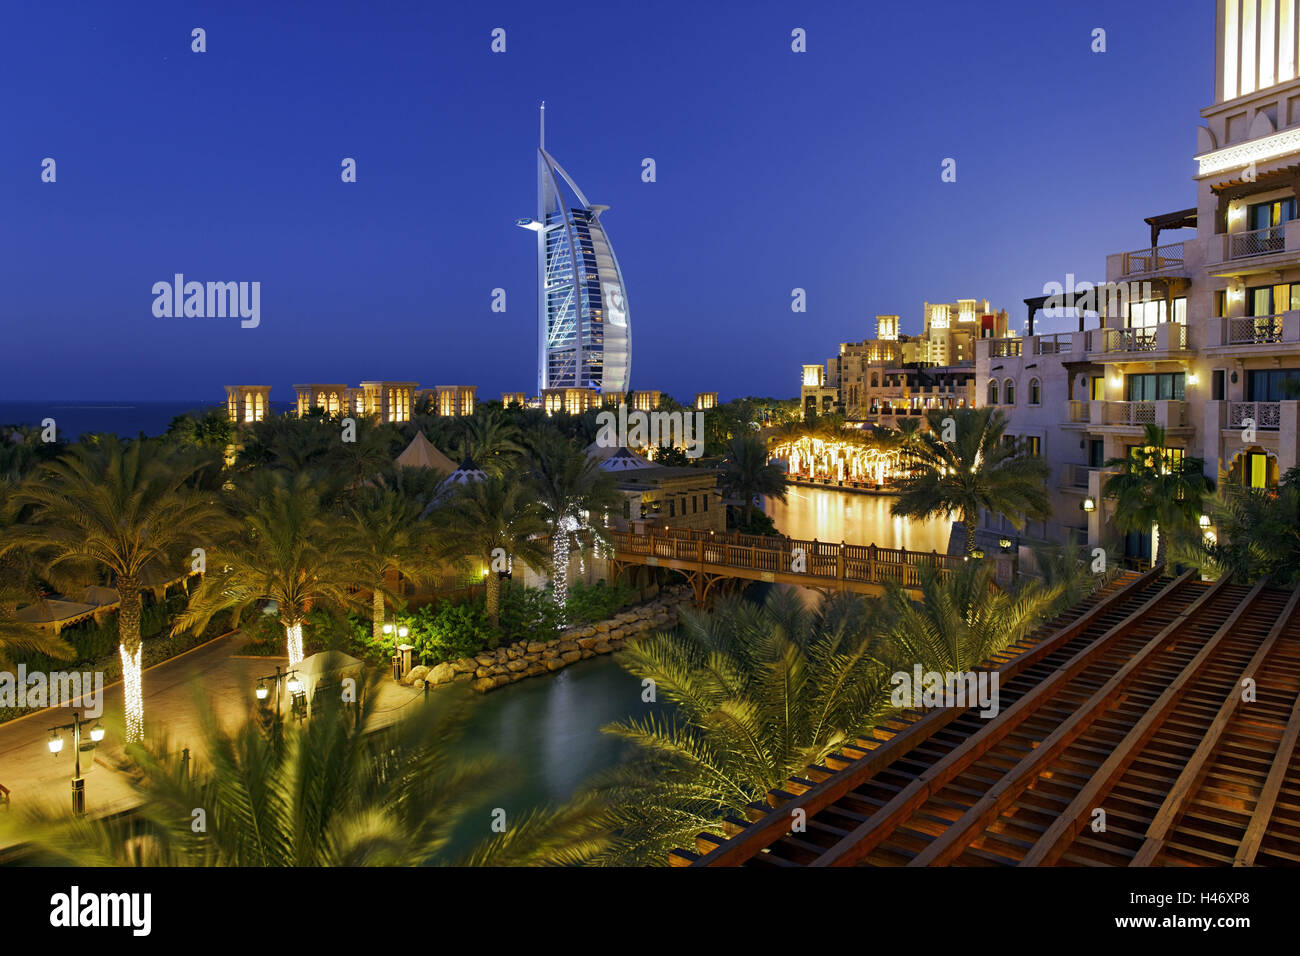 Burj Al Arab and Medinat hotels, 7 stars hotel, Jumeirah, Dubai, United Arab Emirates, - Stock Image